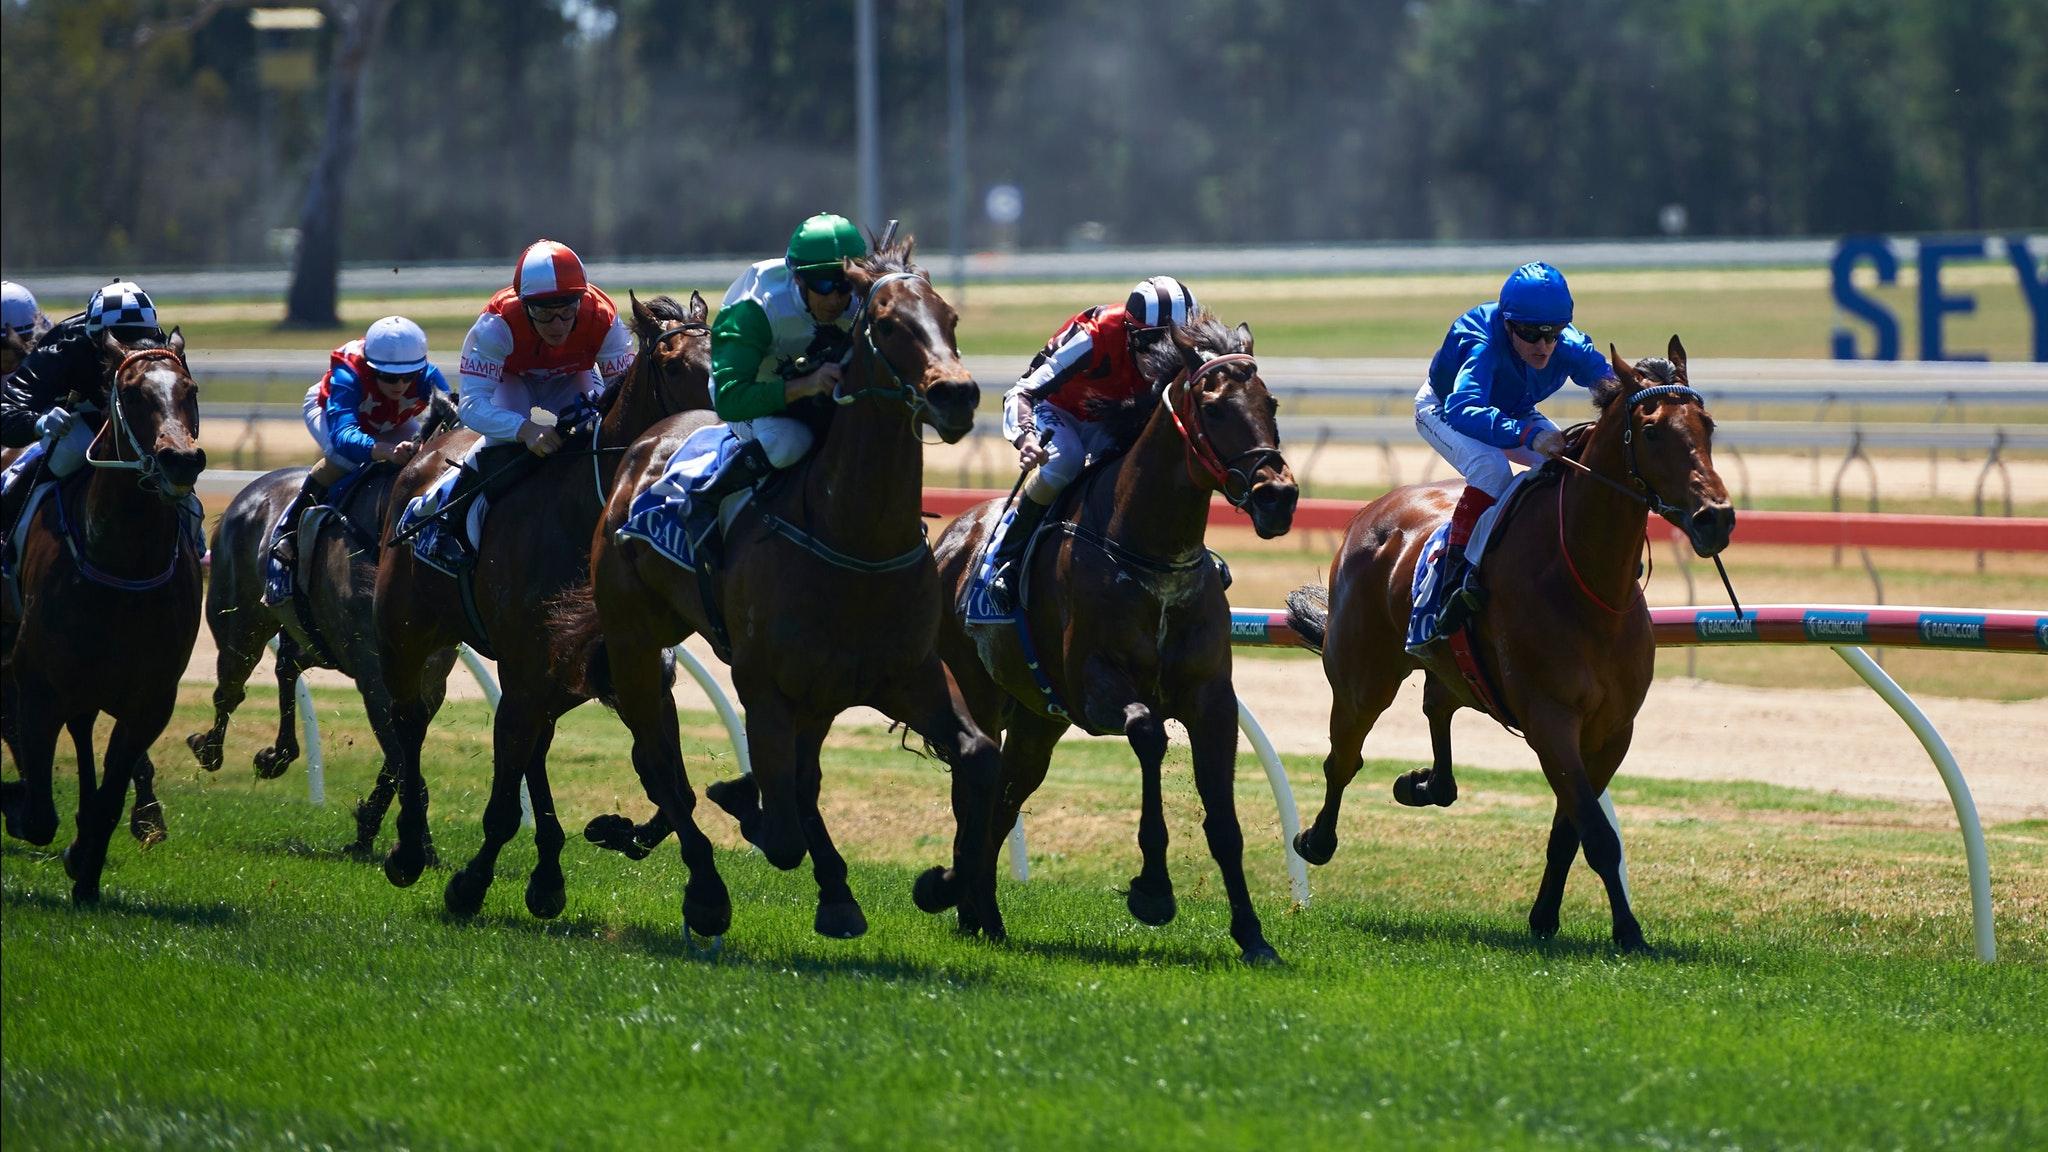 Racing at Seymour